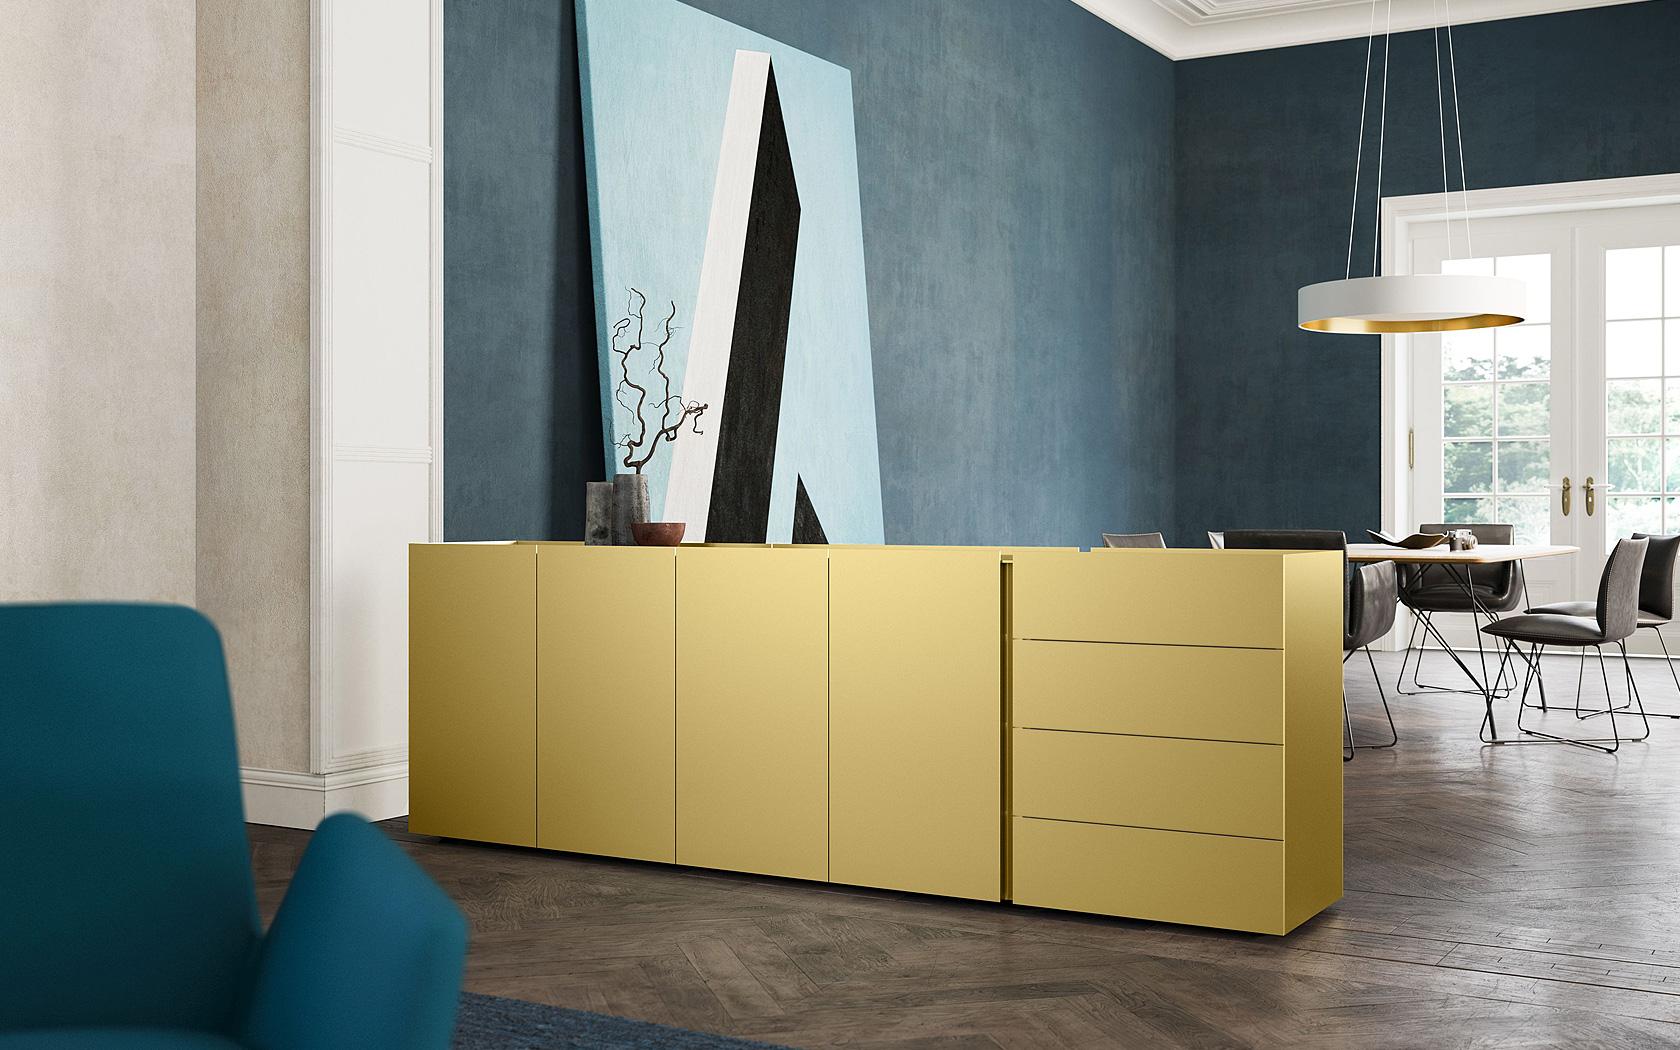 hamacher raumdesign m bel stoffe bodenbel ge leuchten. Black Bedroom Furniture Sets. Home Design Ideas